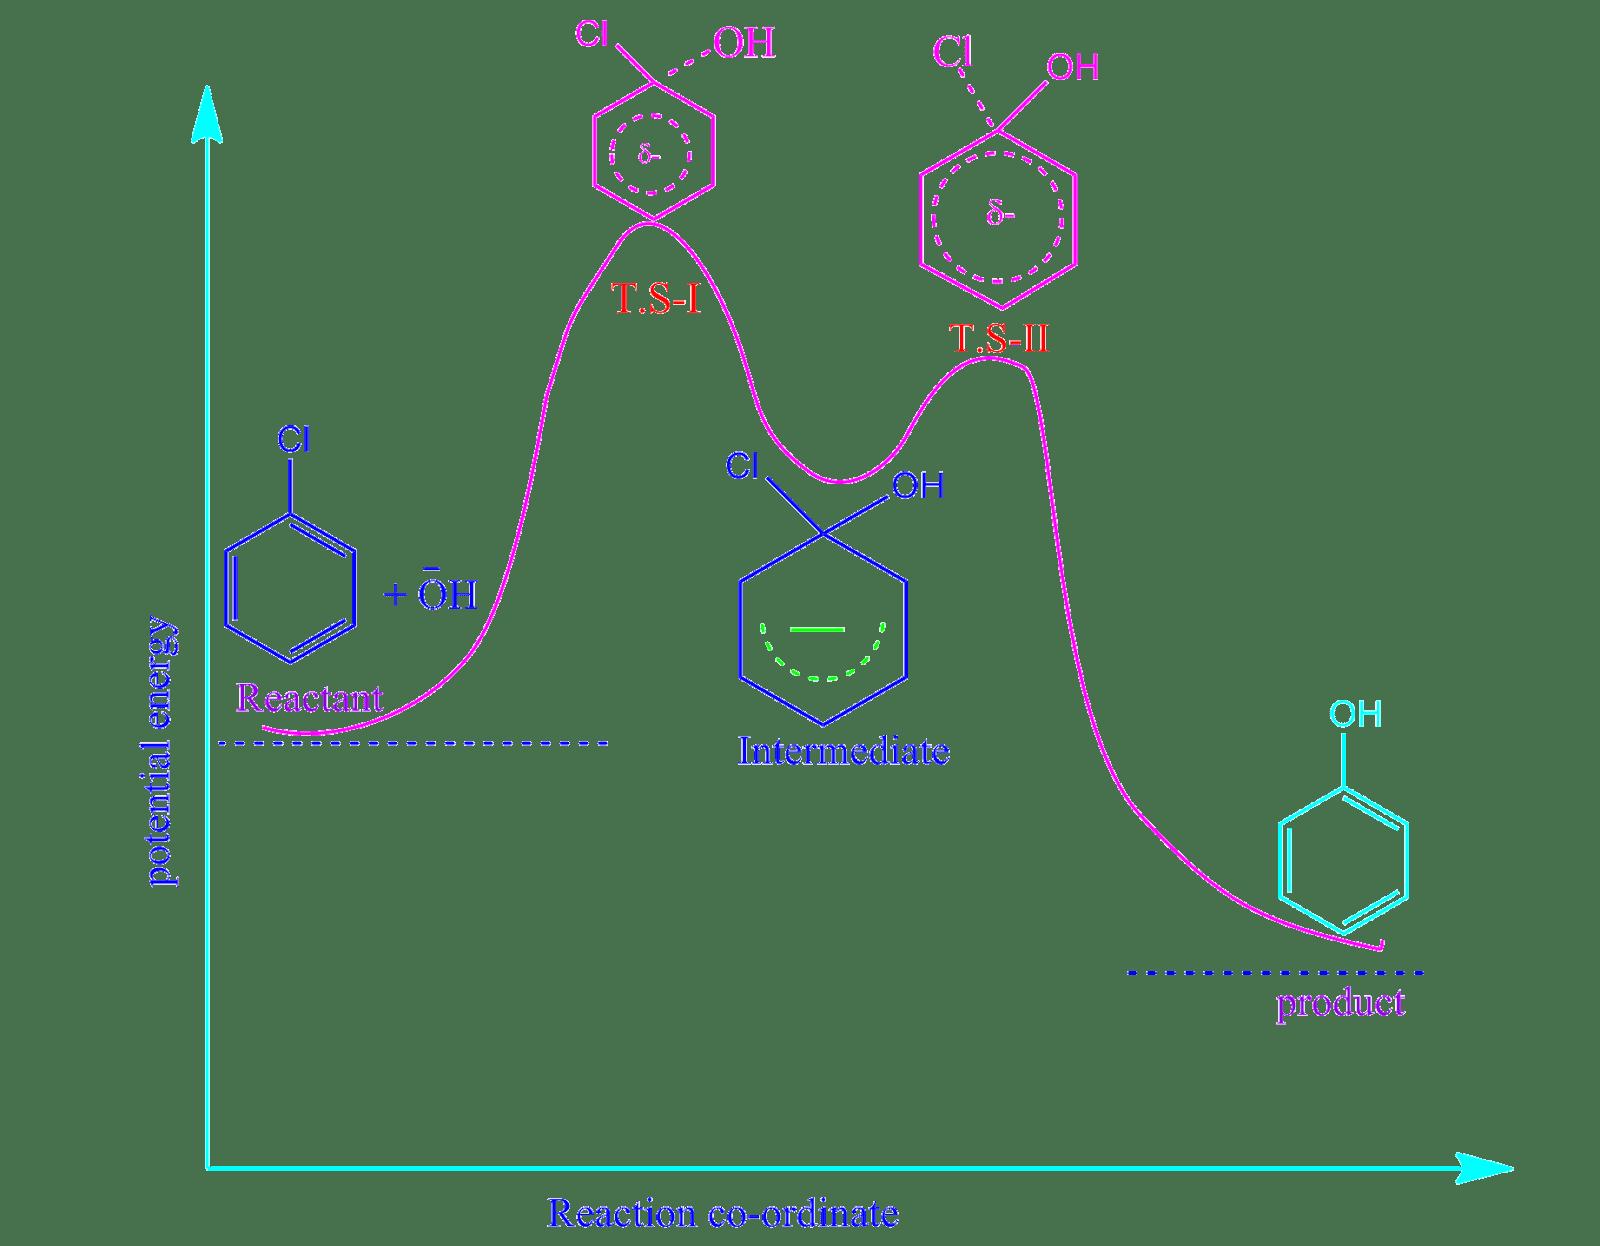 hight resolution of  iii addition elimination reaction mechanism